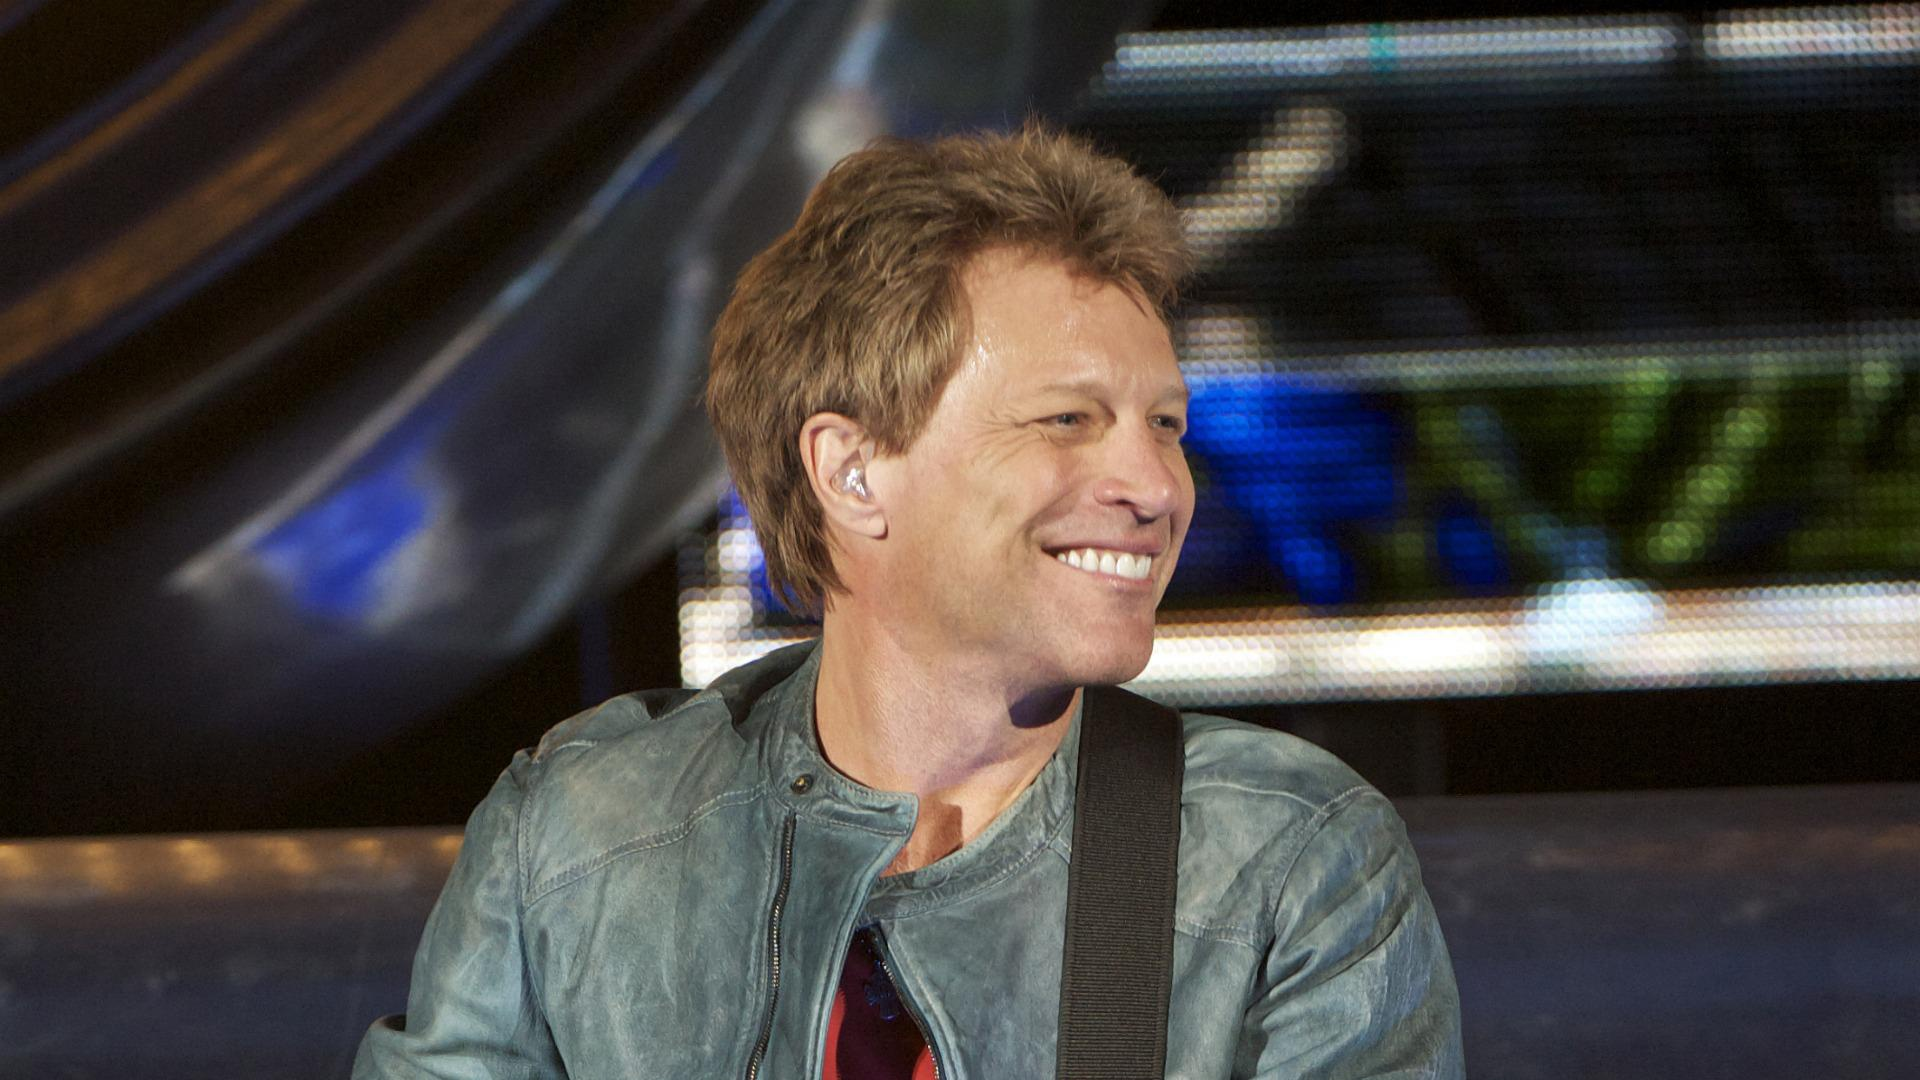 An entire U.S. city is boycotting Jon Bon Jovi